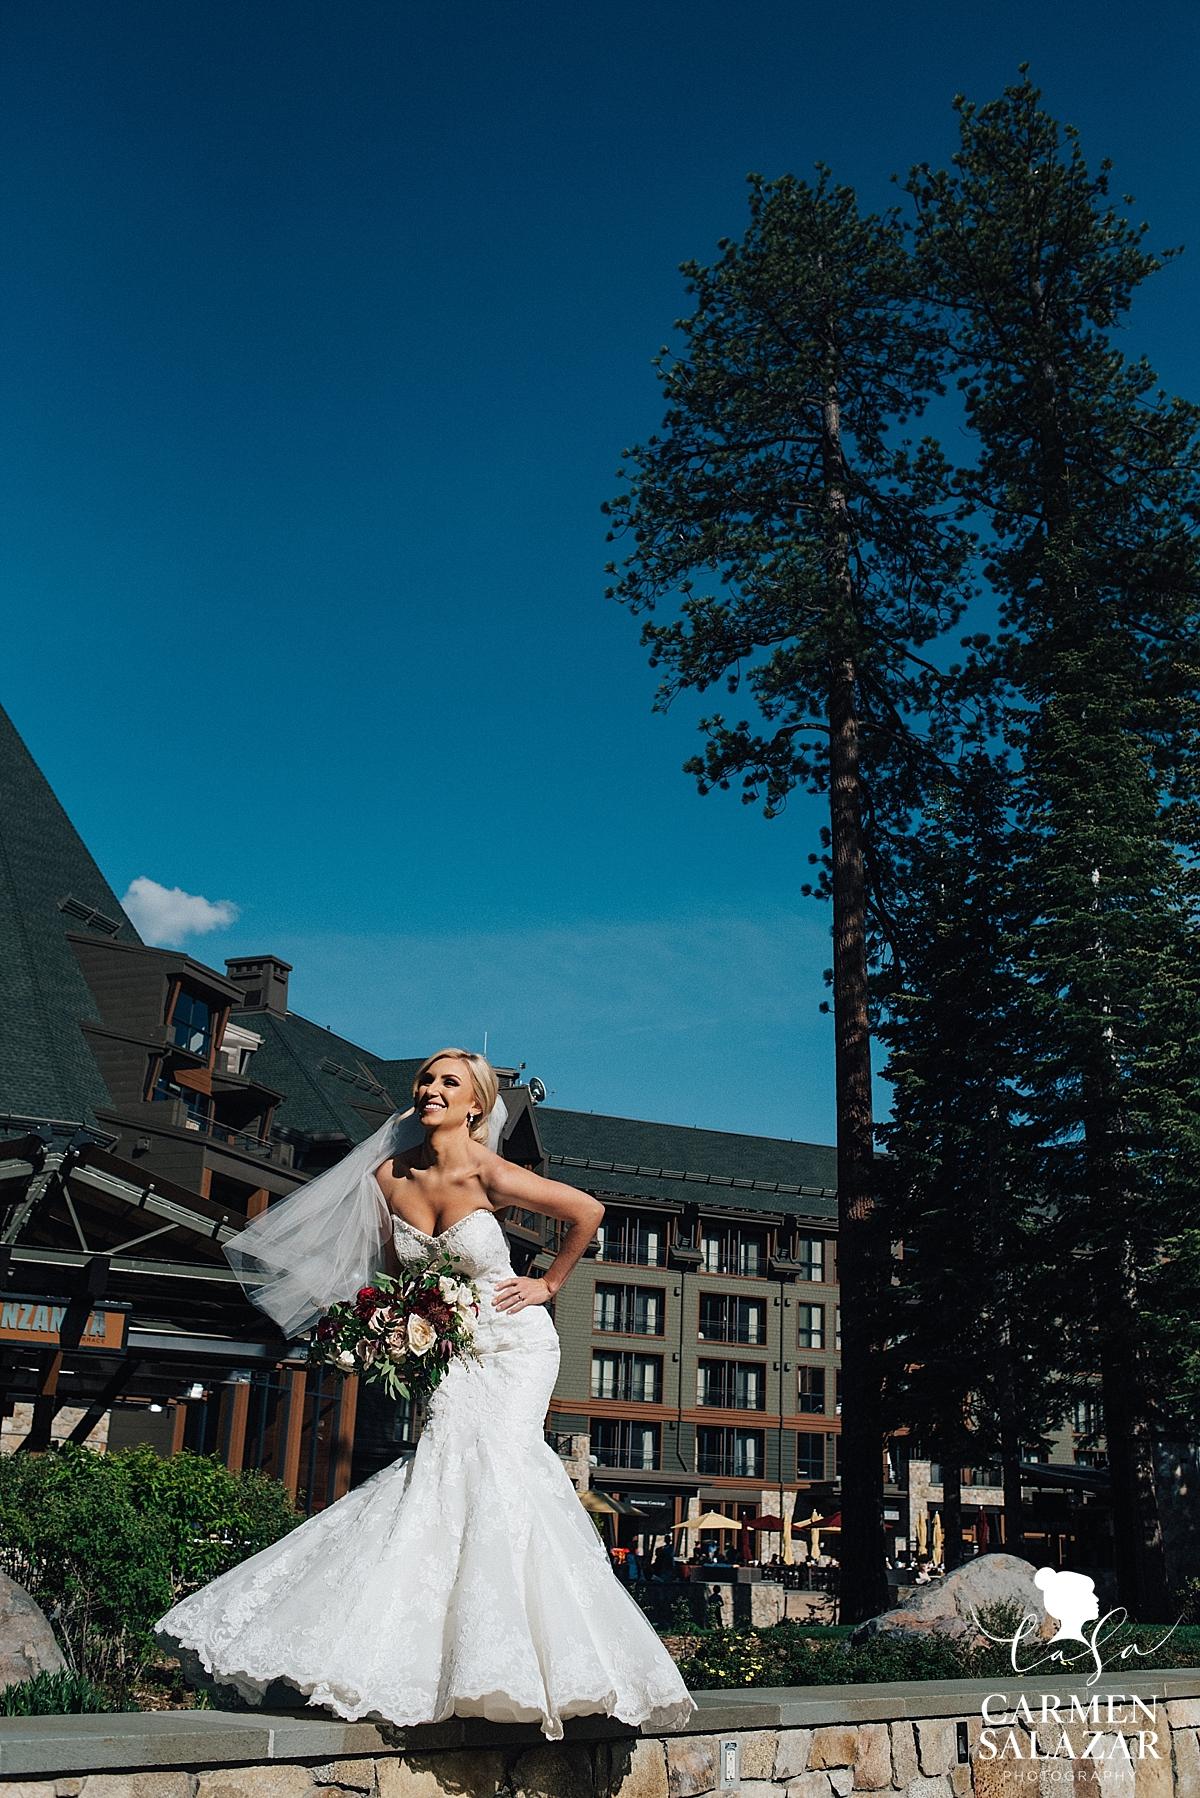 Tahoe bridal fashion photography - Carmen Salazar